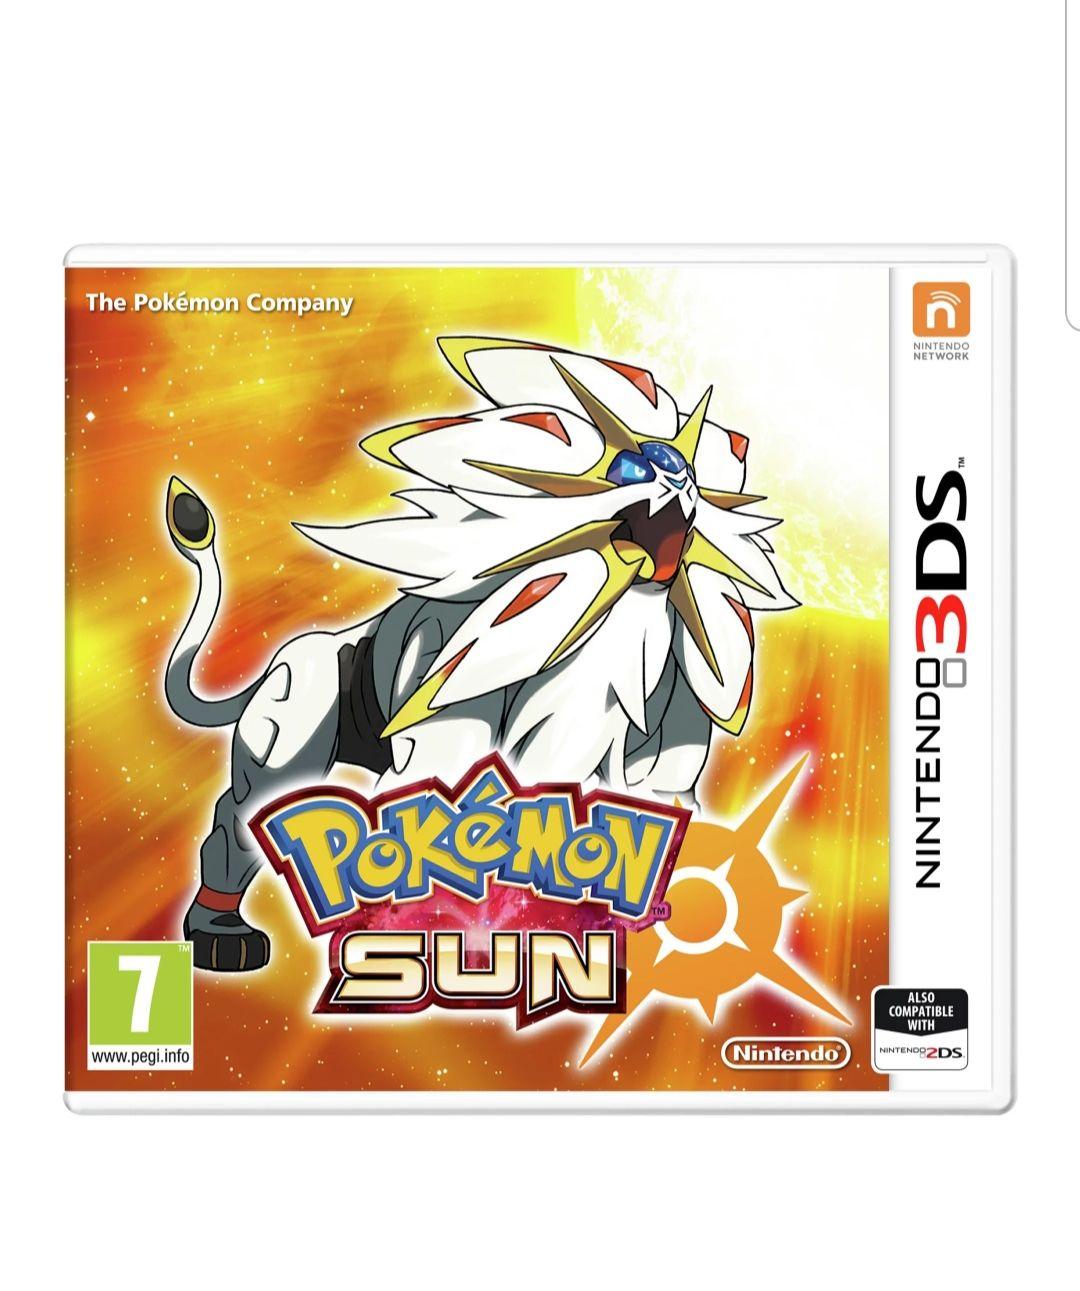 Pokemon Sun And Moon Nintendo 3ds £9.99 + £3.95 Postage @ Argos